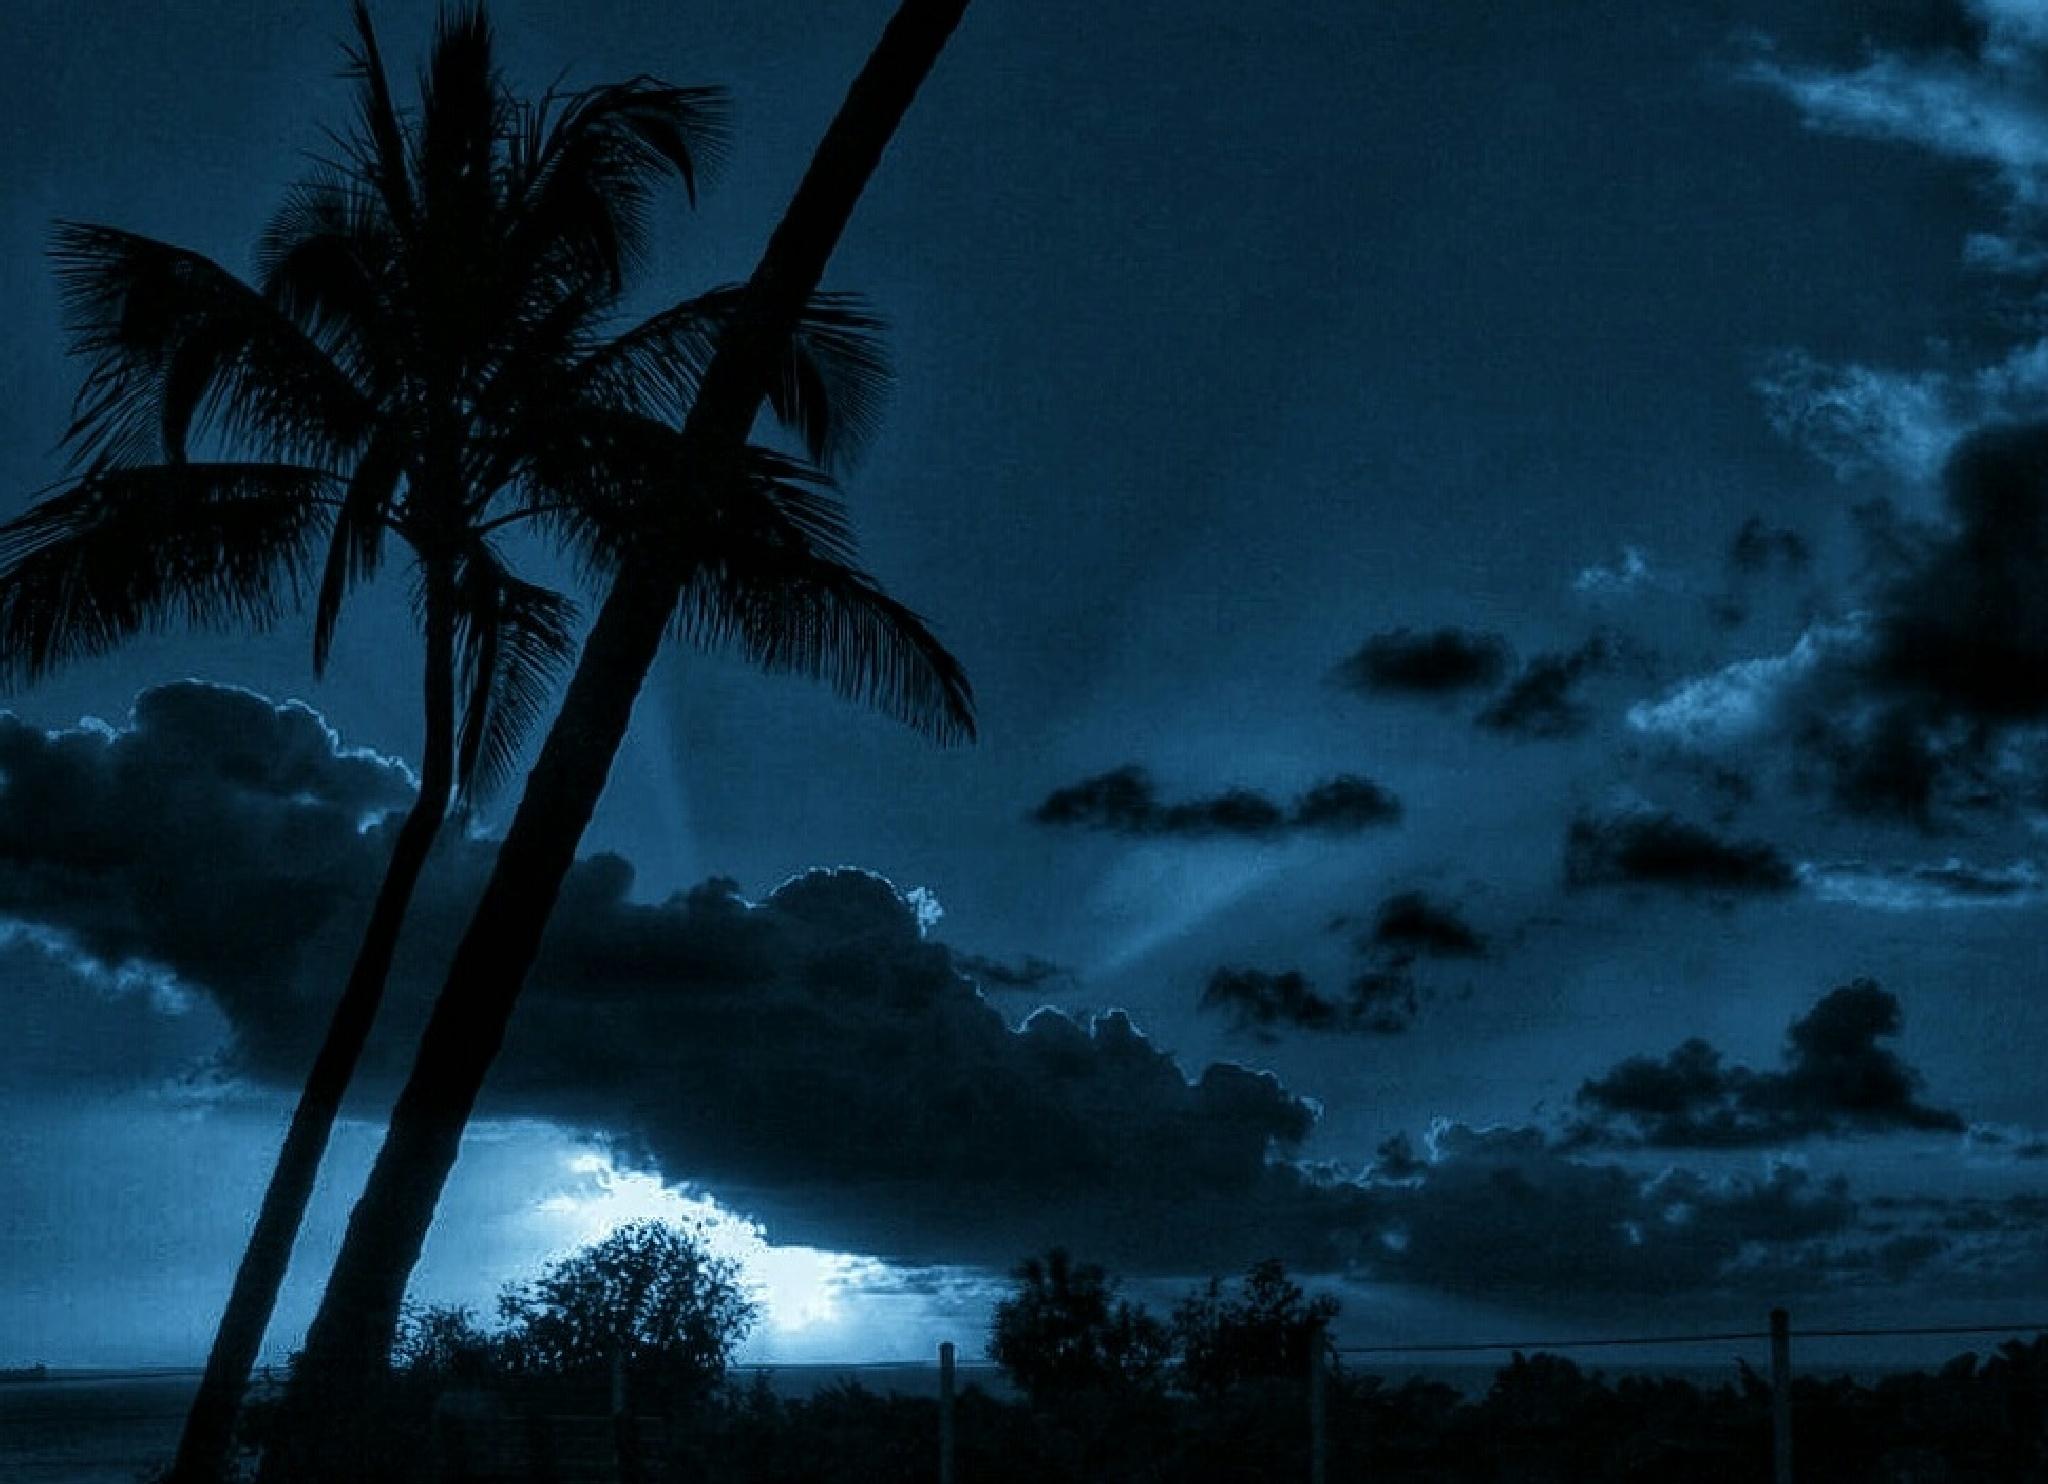 Hawaiin Blues by Ming_Bear